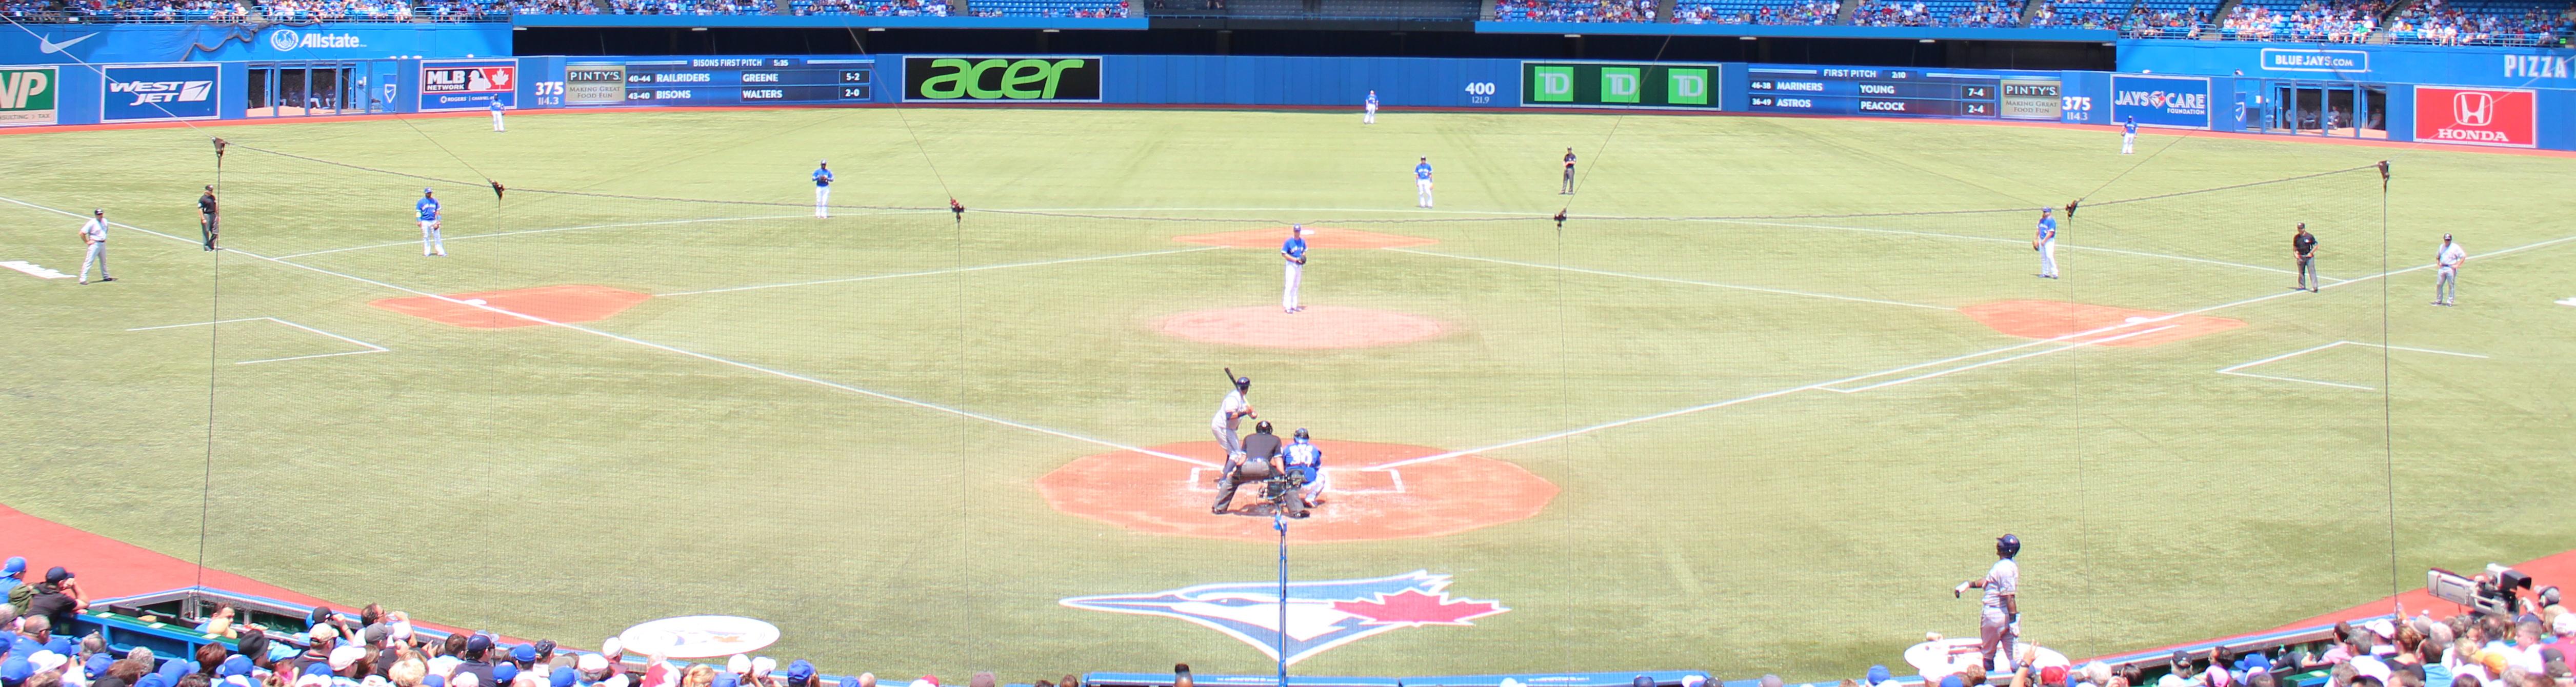 Rogers_Centre_Field.jpg